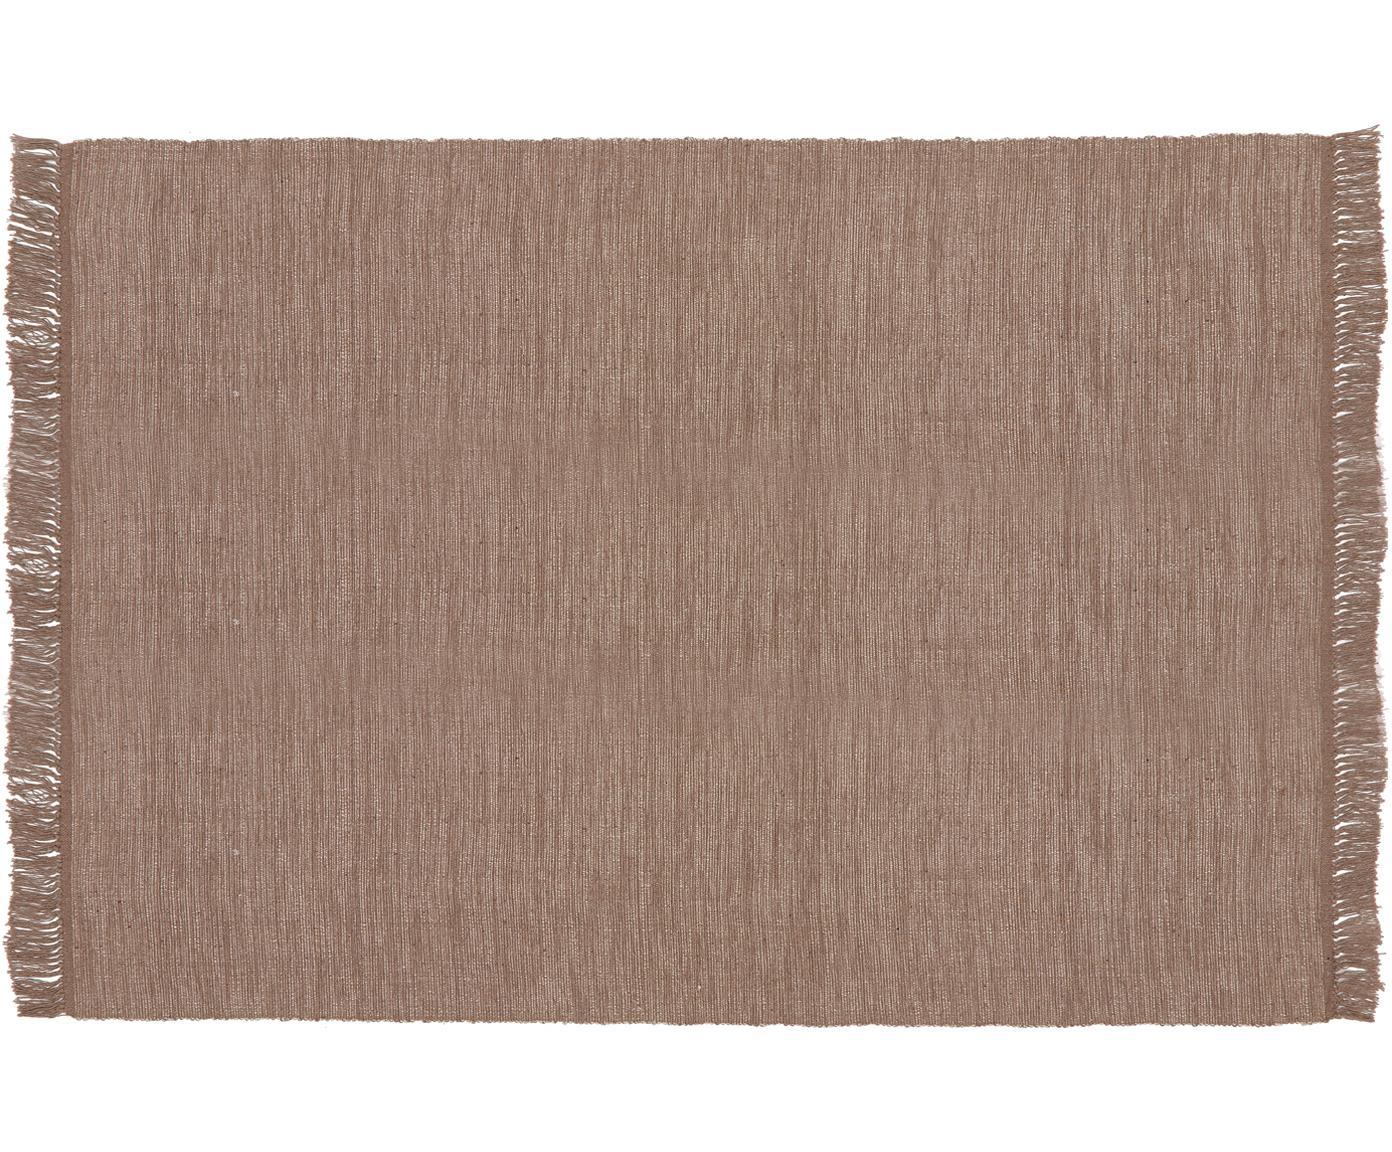 Alfombra de algodón con flecos Dag, Algodón, Gris pardo, An 140 x L 200 cm (Tamaño S)